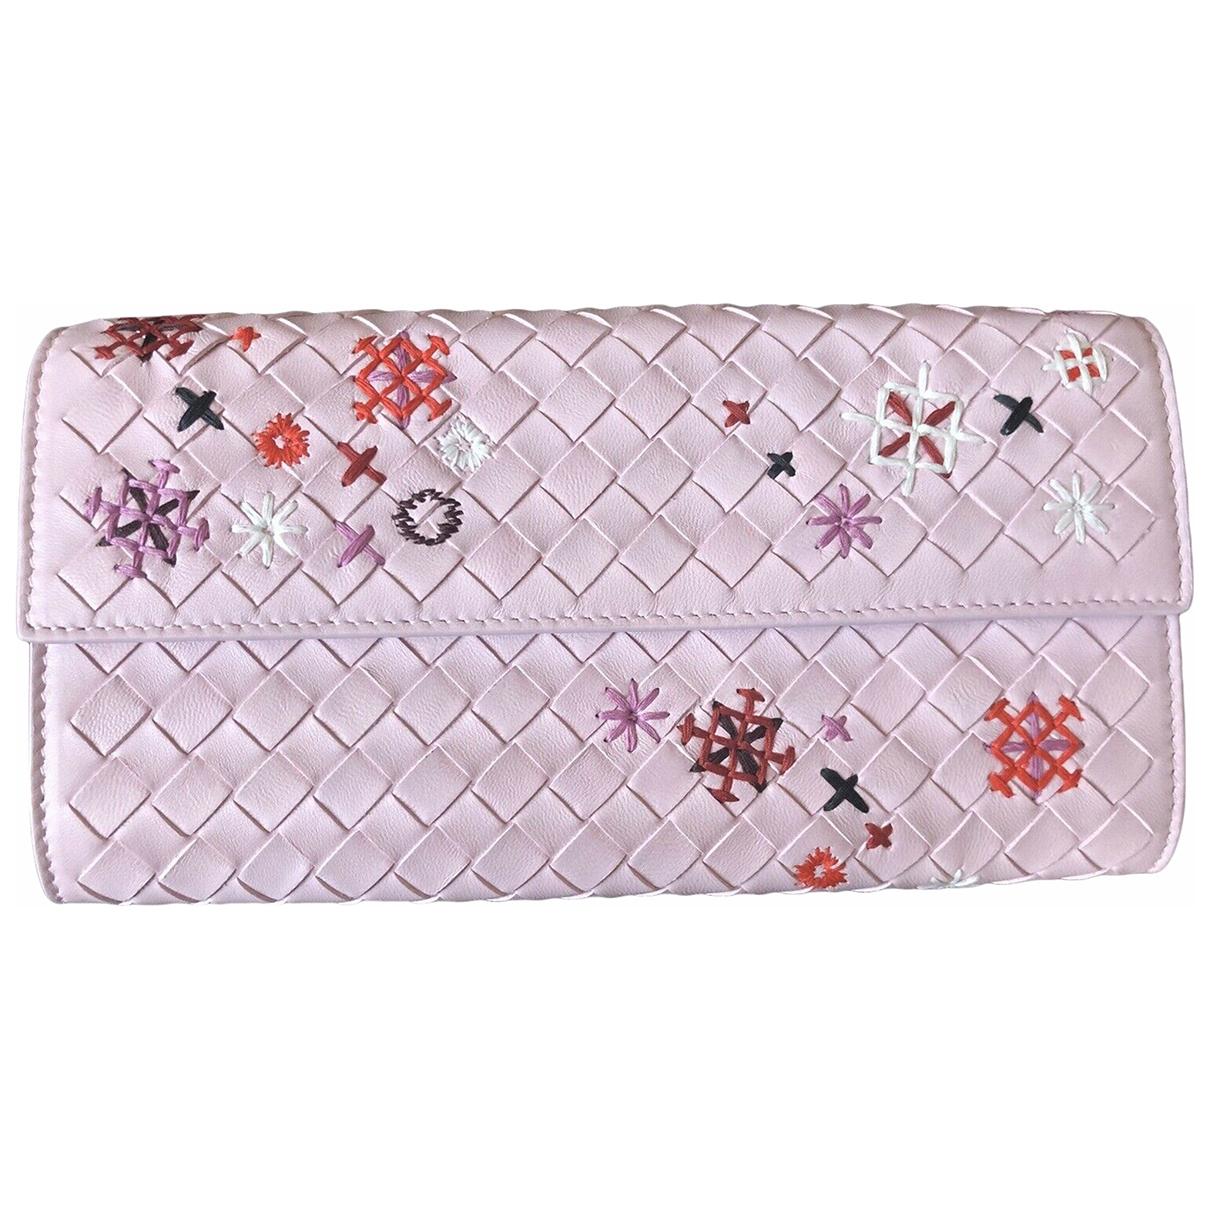 Bottega Veneta Intrecciato Pink Leather wallet for Women \N